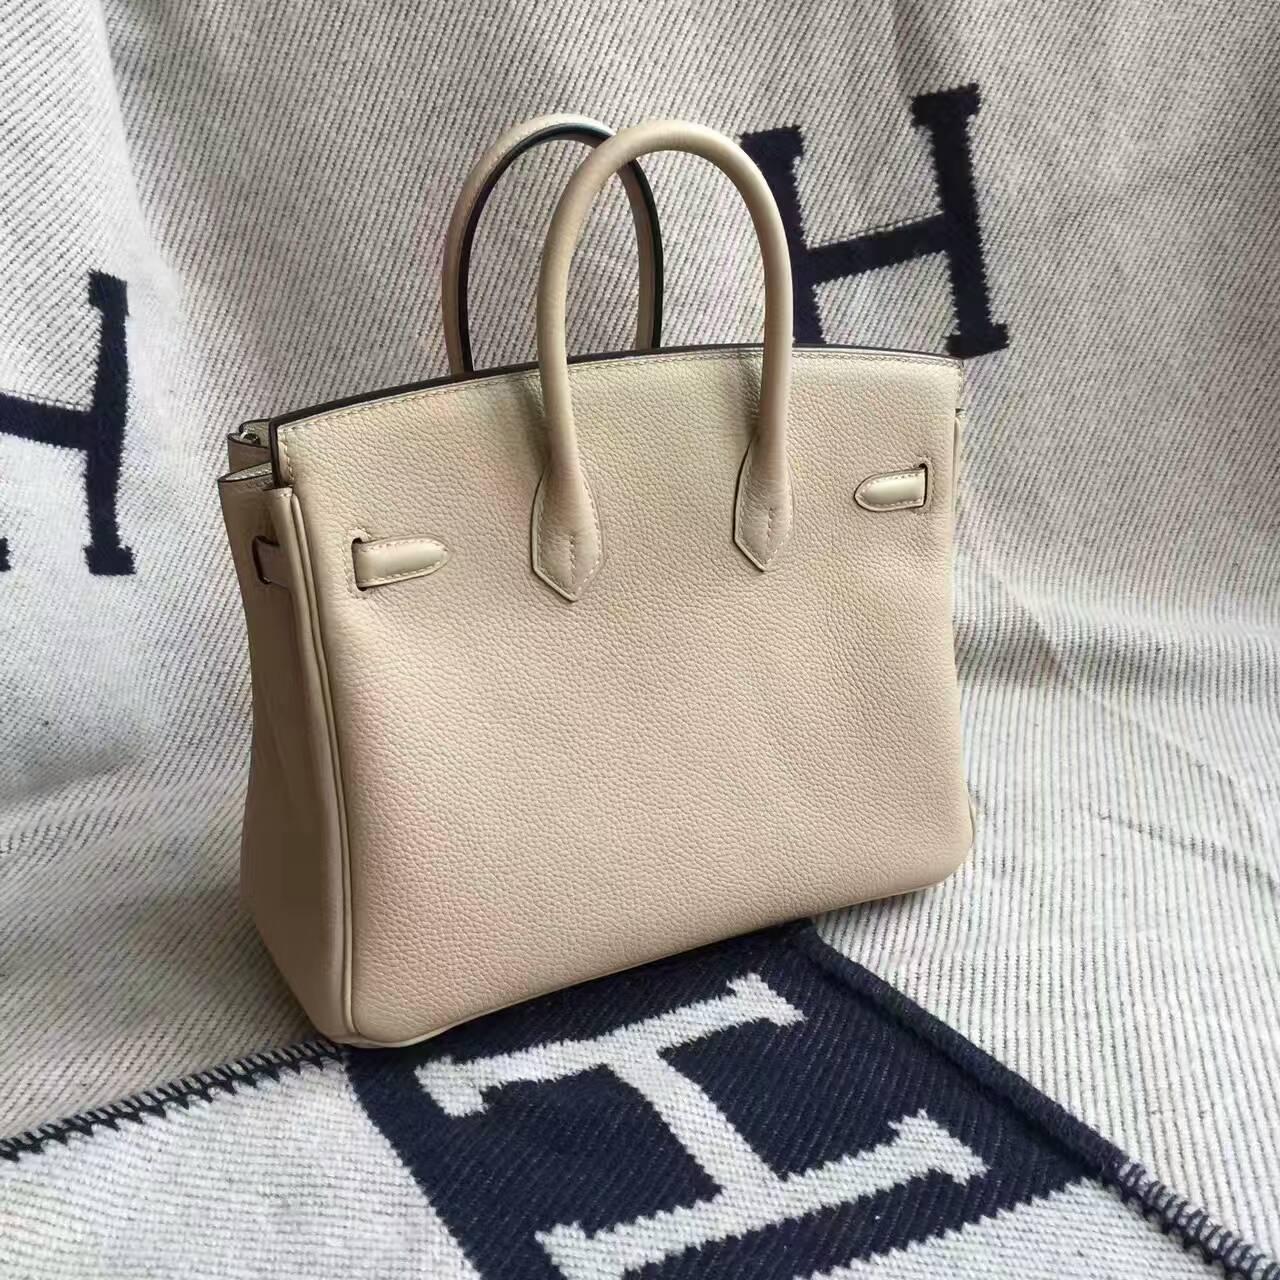 Wholesale Hermes Togo Calskin Leather Birkin25cm Handbag in S2 Coat Grey